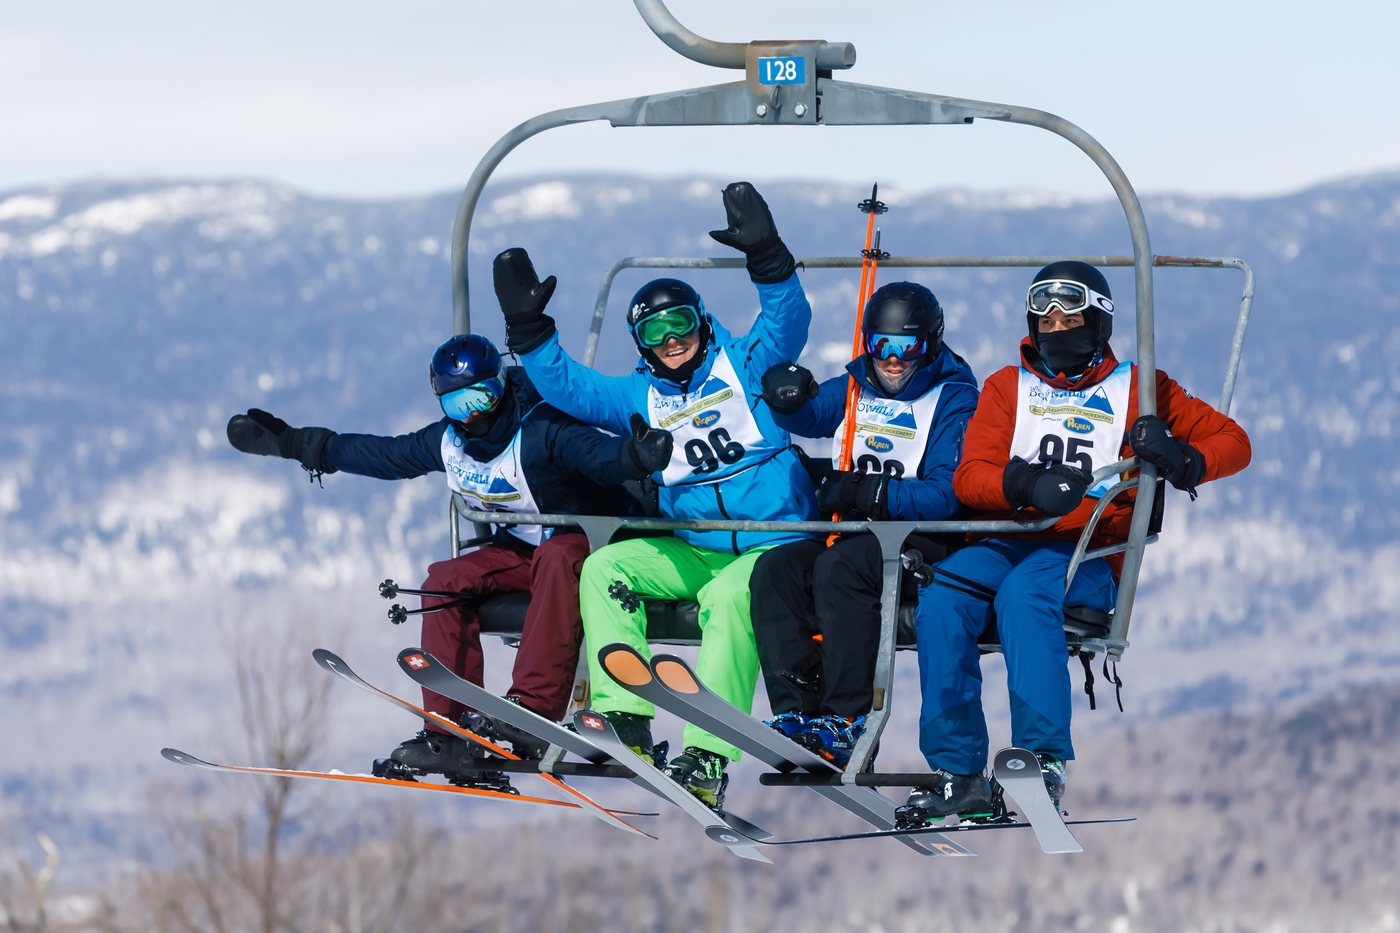 WinterKids Downhill 24 2021 SDP 3193